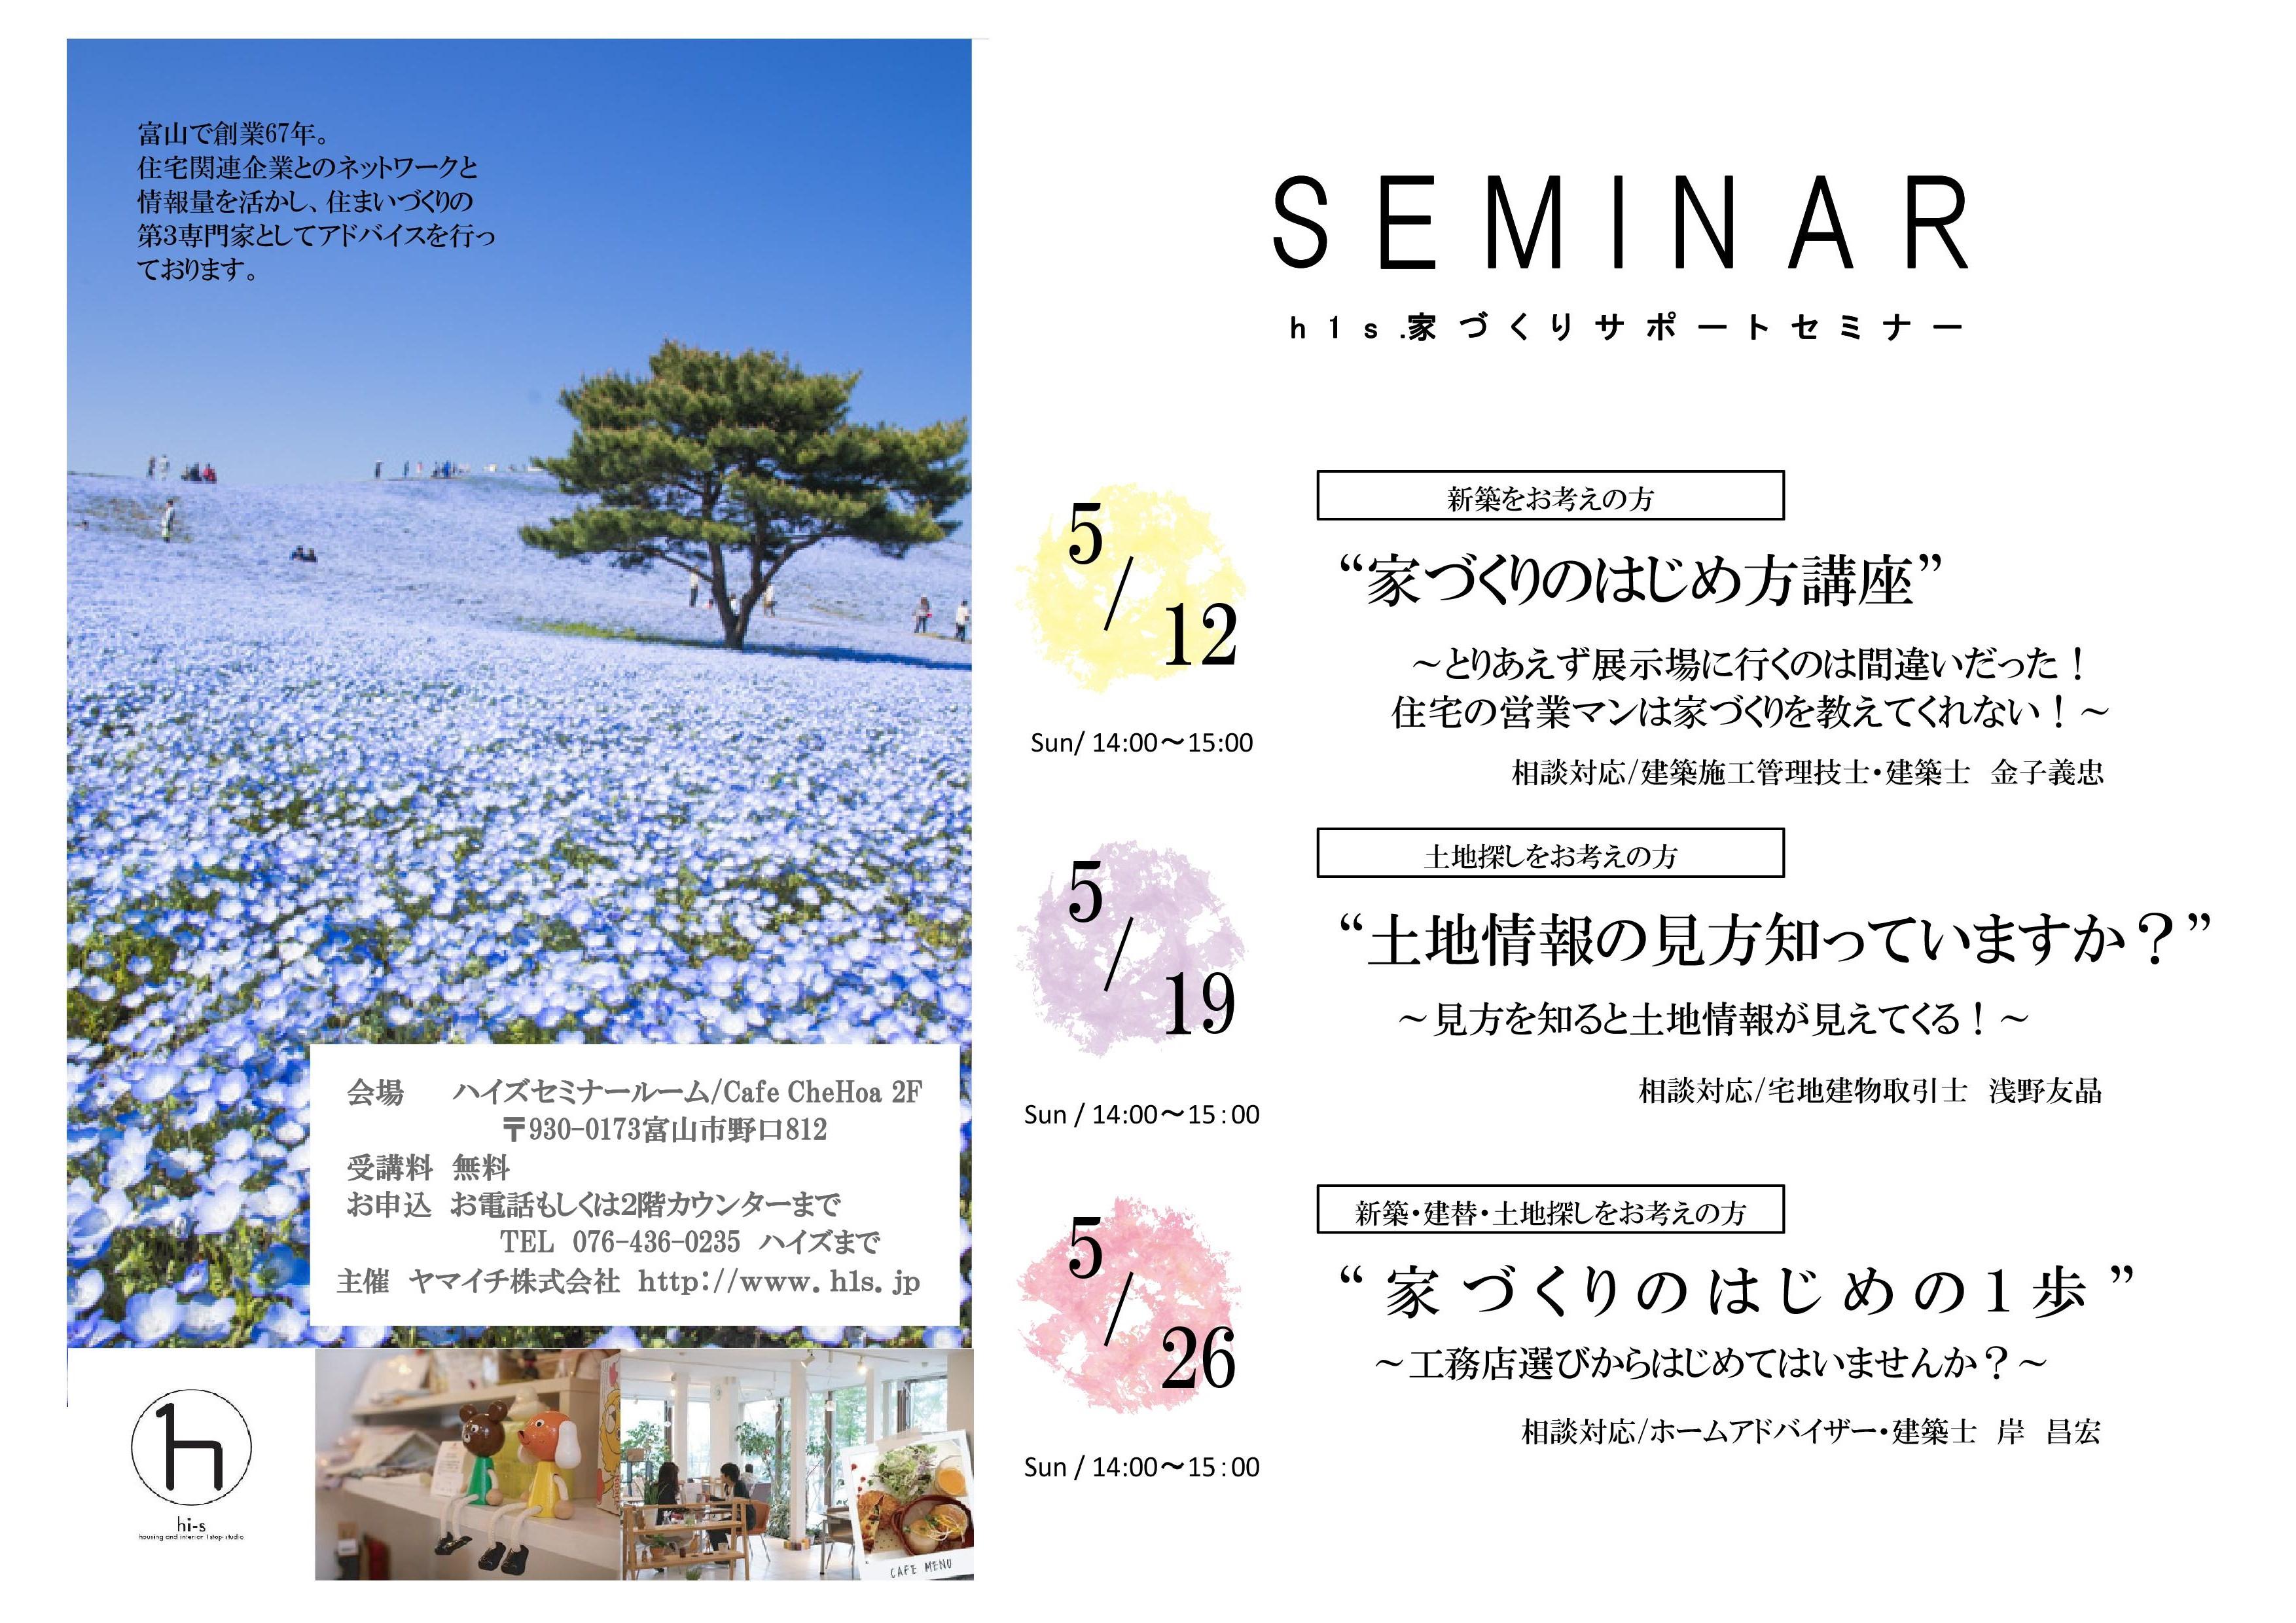 seminar-1905